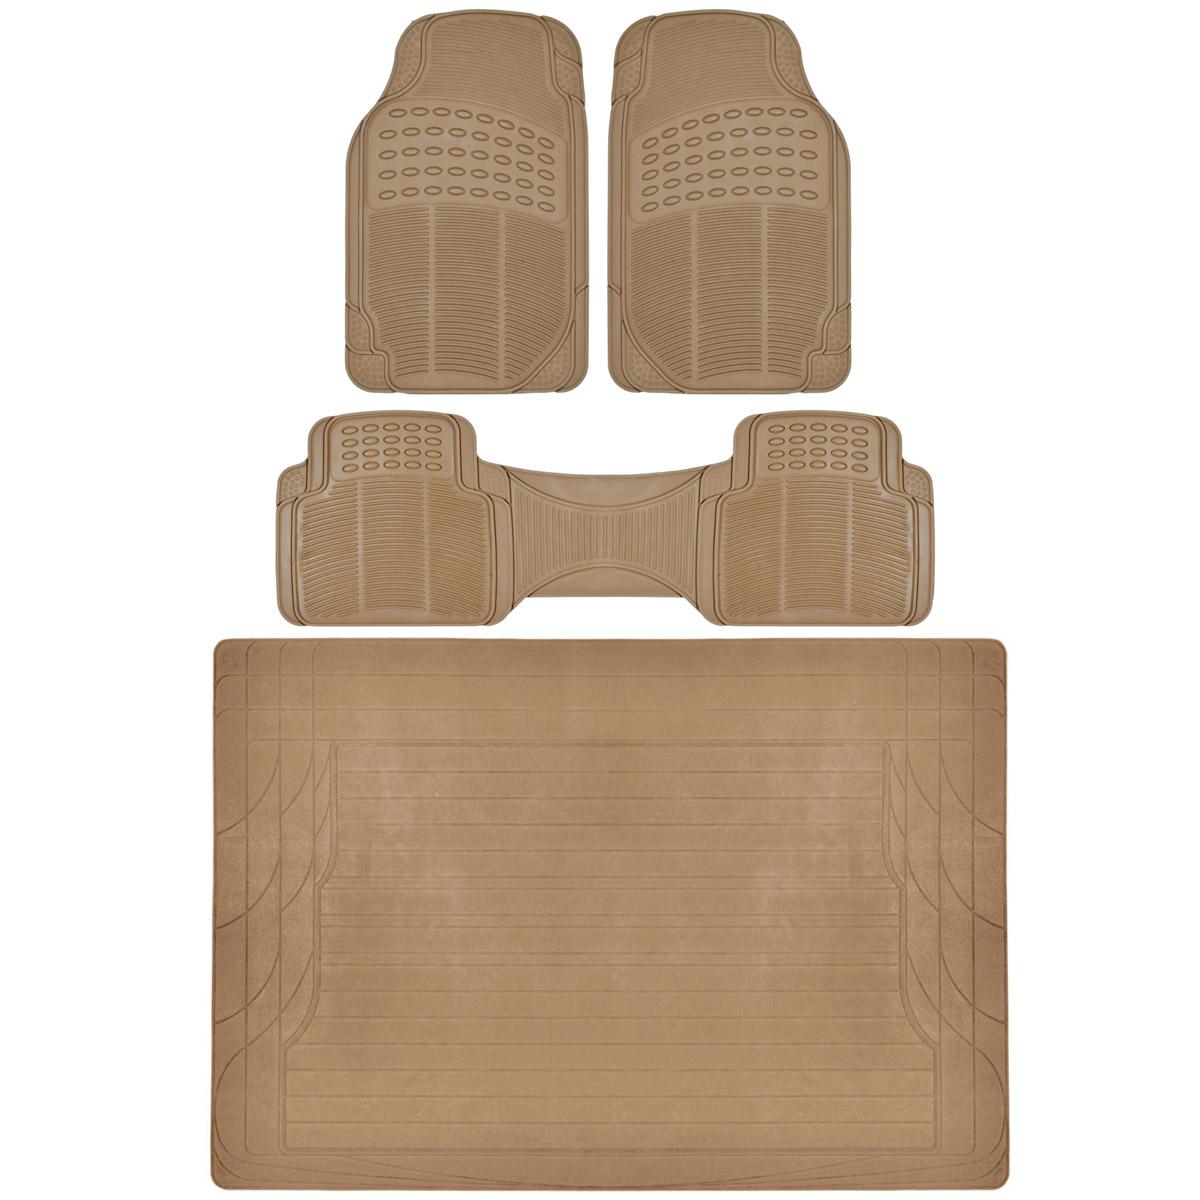 4 PC Set Auto Floor Mats Car Truck SUV Beige Semi Custom